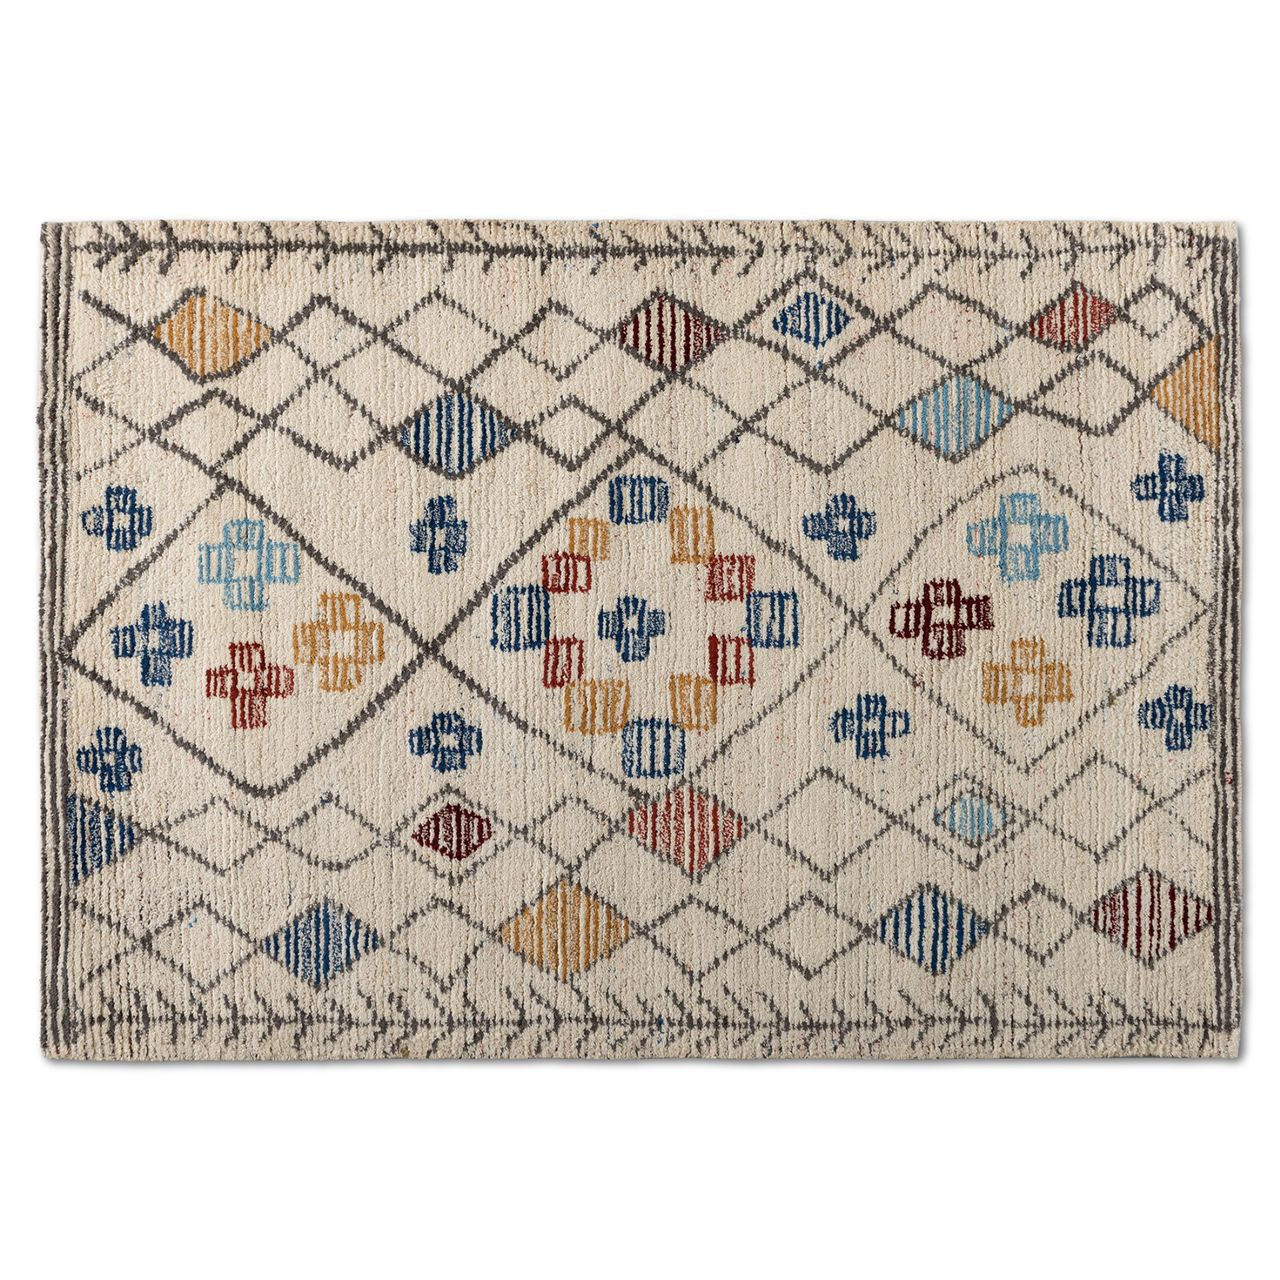 Baxton Studio Triton Multi-Colored Hand-Tufted Wool Area Rug